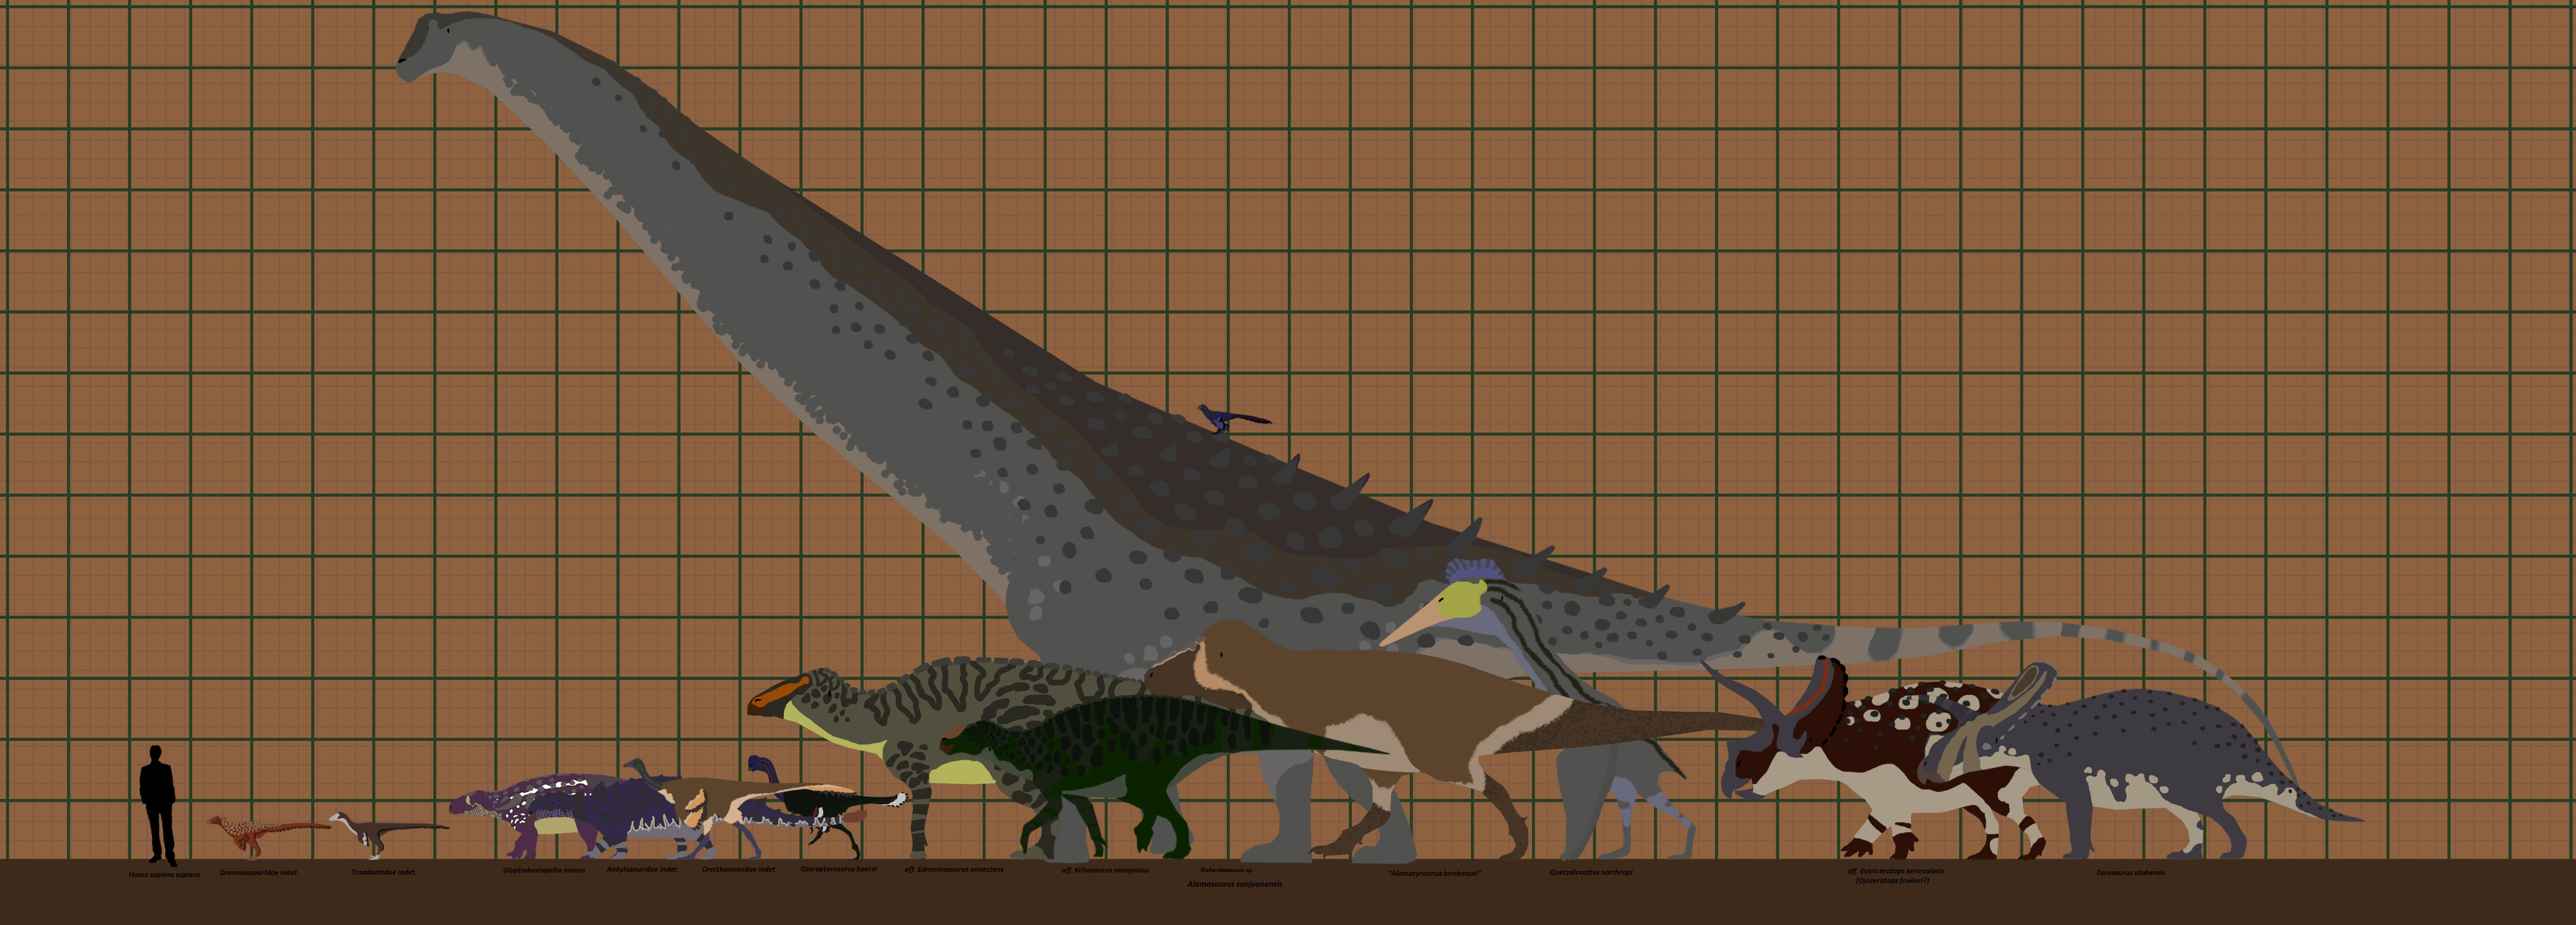 Dinosaur Size Charts Eye_of_the_alamo_by_randomdinos-da8o132